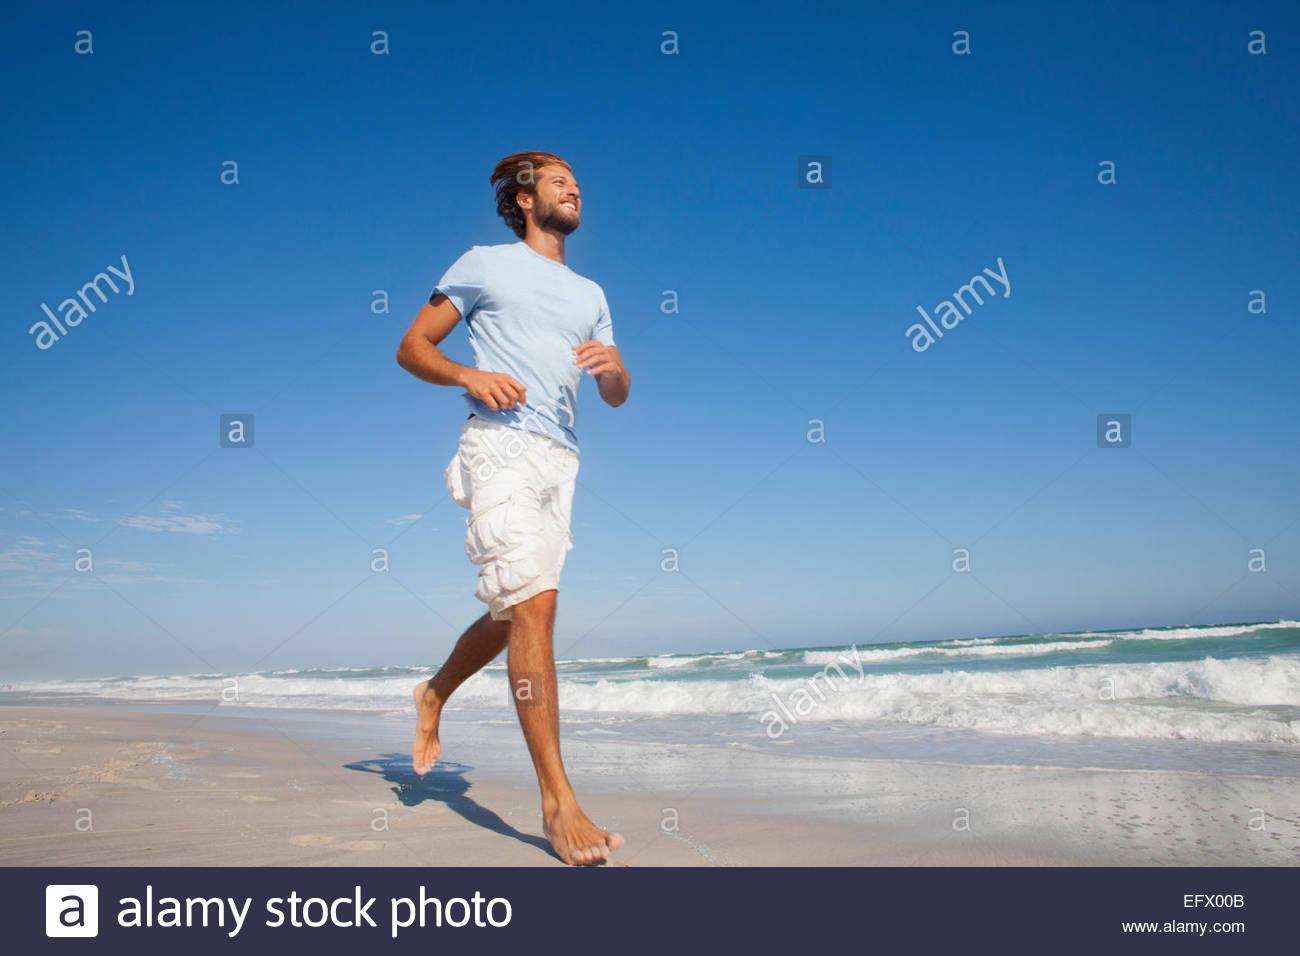 Smiling Man running on sunny beach - Stock Image